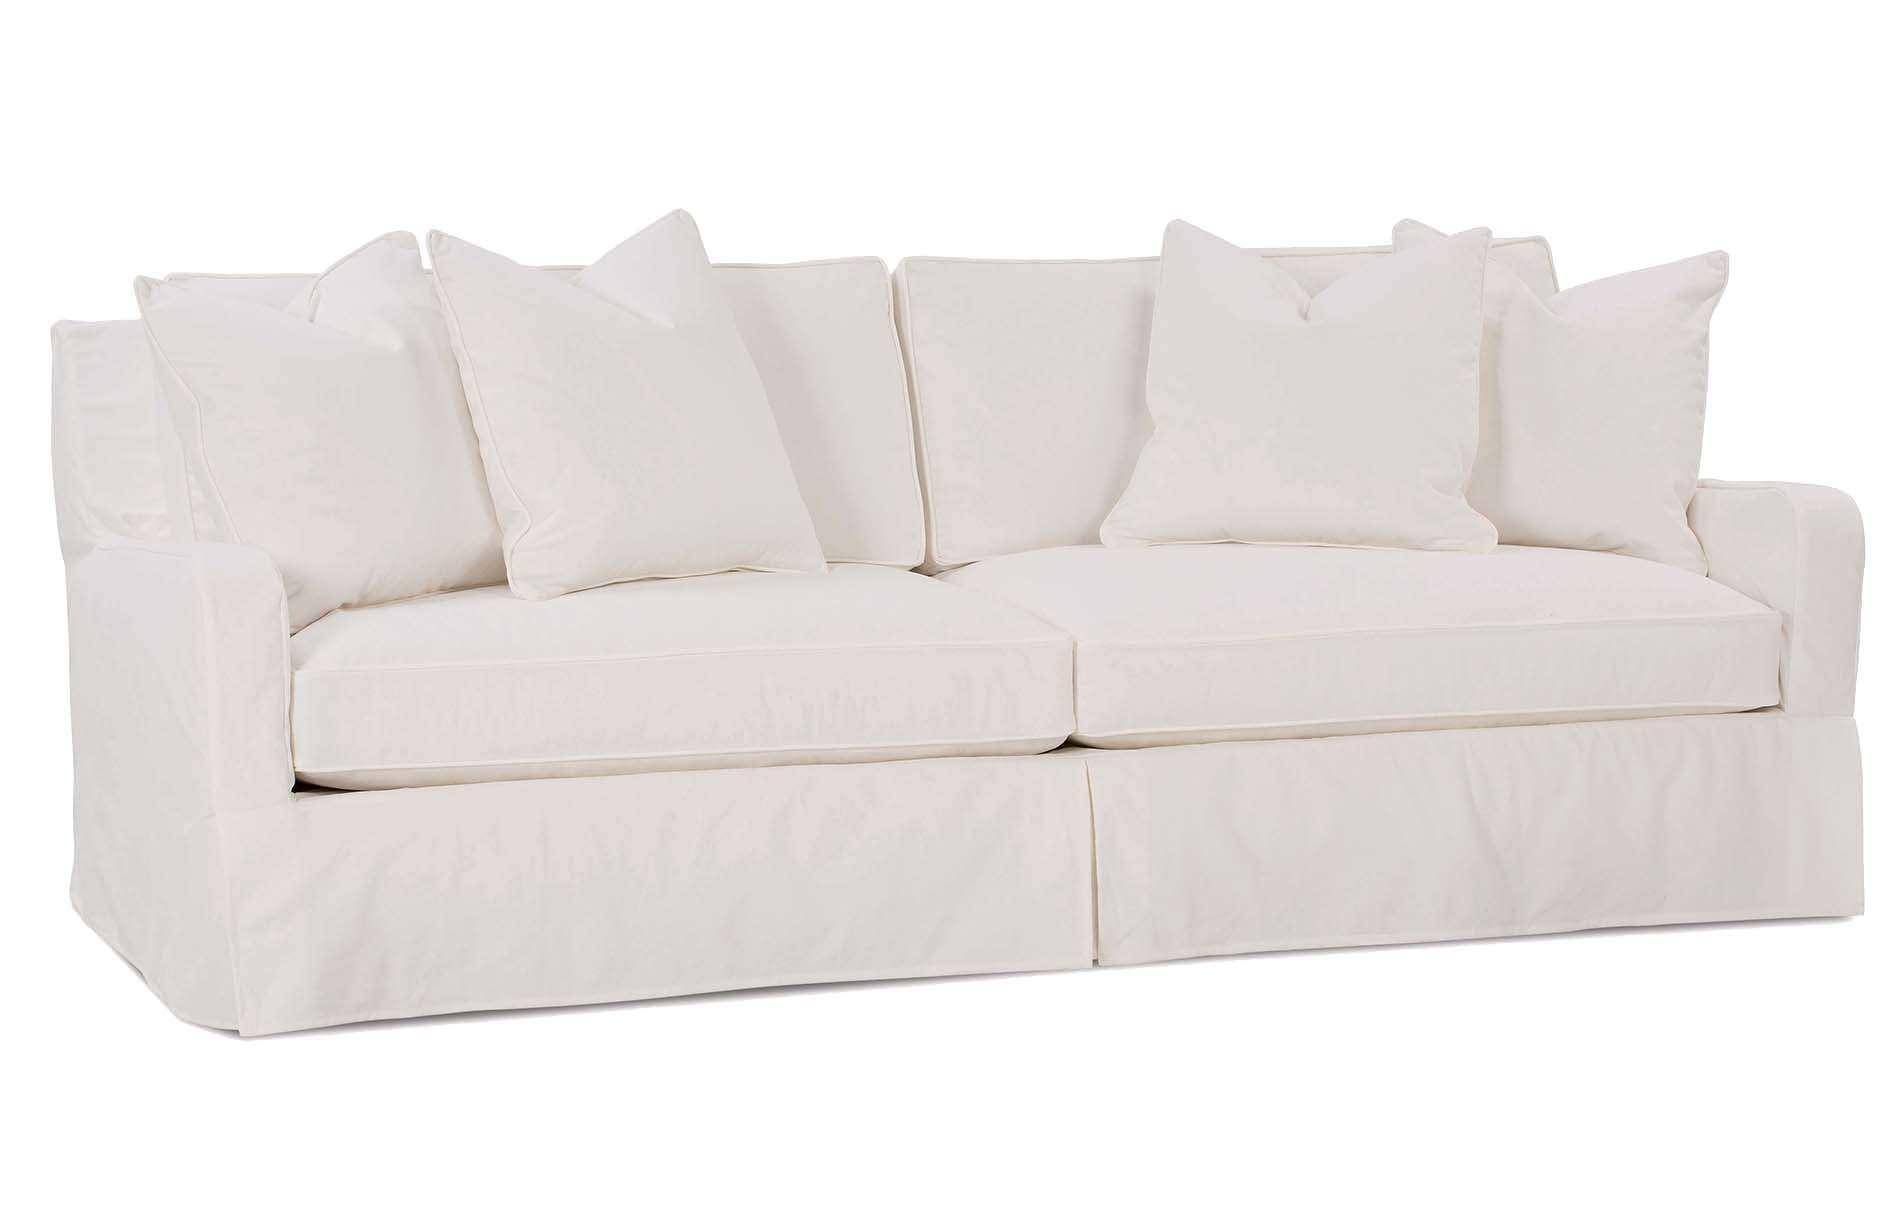 Sofas Center : Slipcover Style Sofa And Loveseat Sets Sofas With Slipcover Style Sofas (View 15 of 20)